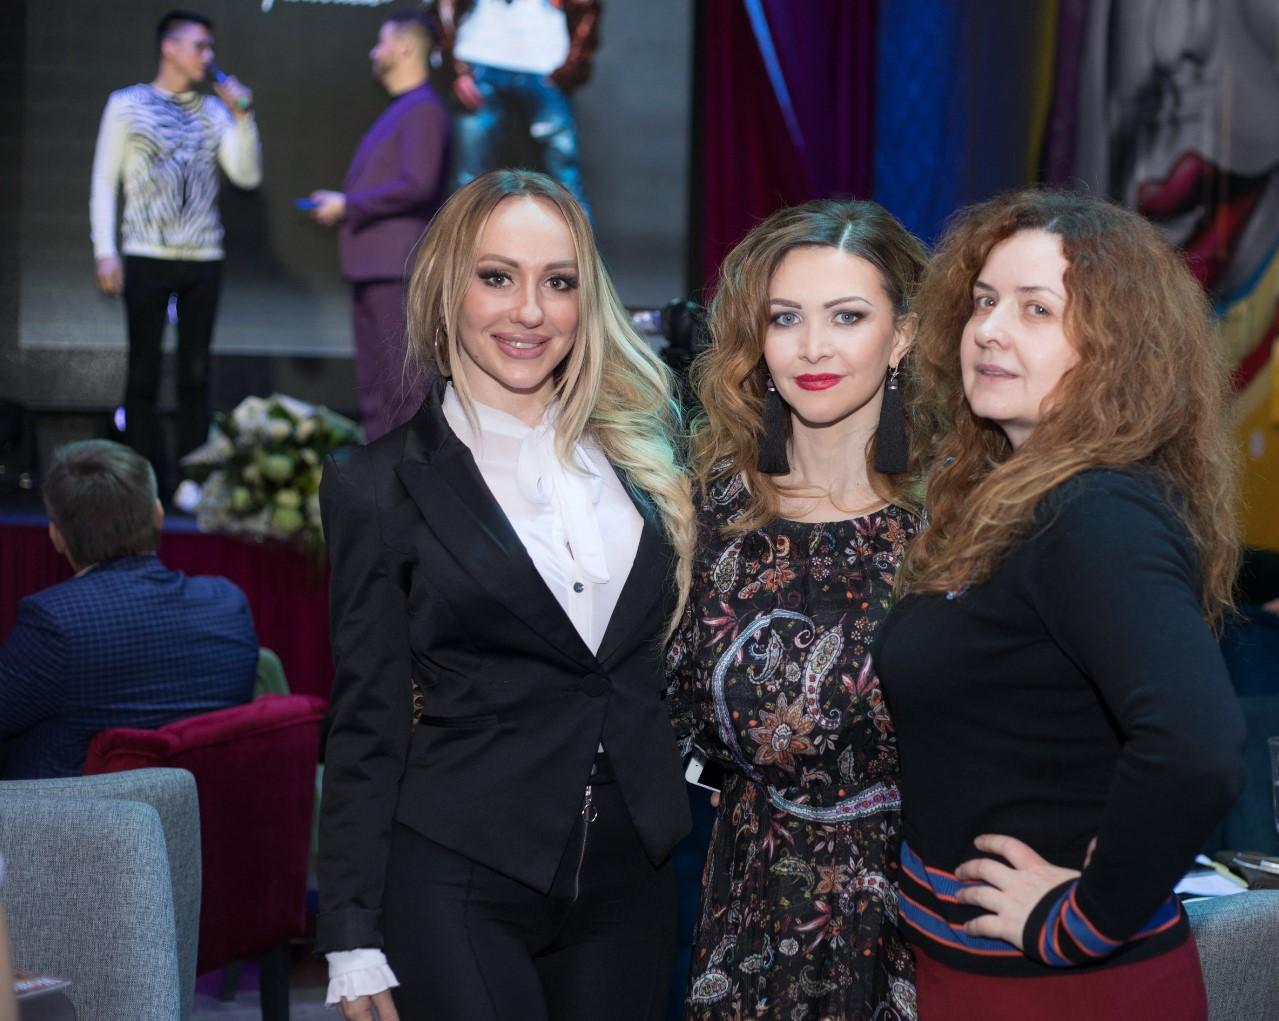 natalya-solovey-vladimir-brilyov-prezentoval-klip-ne-nado-falshi